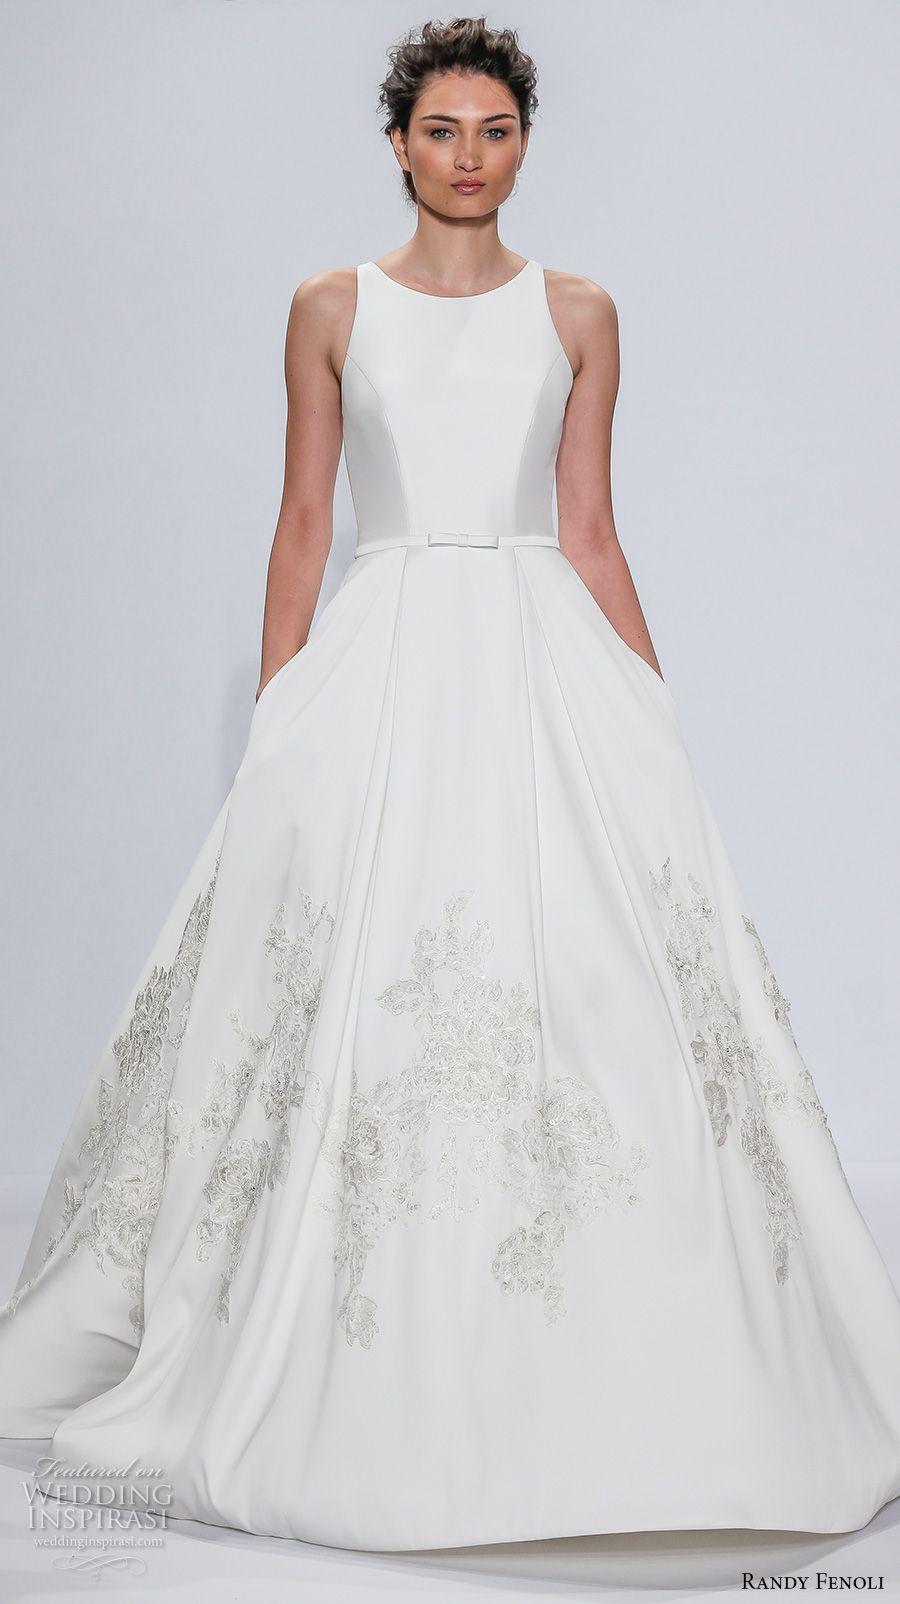 Randy Fenoli Bridal Spring 2018 Wedding Dresses New York Bridal